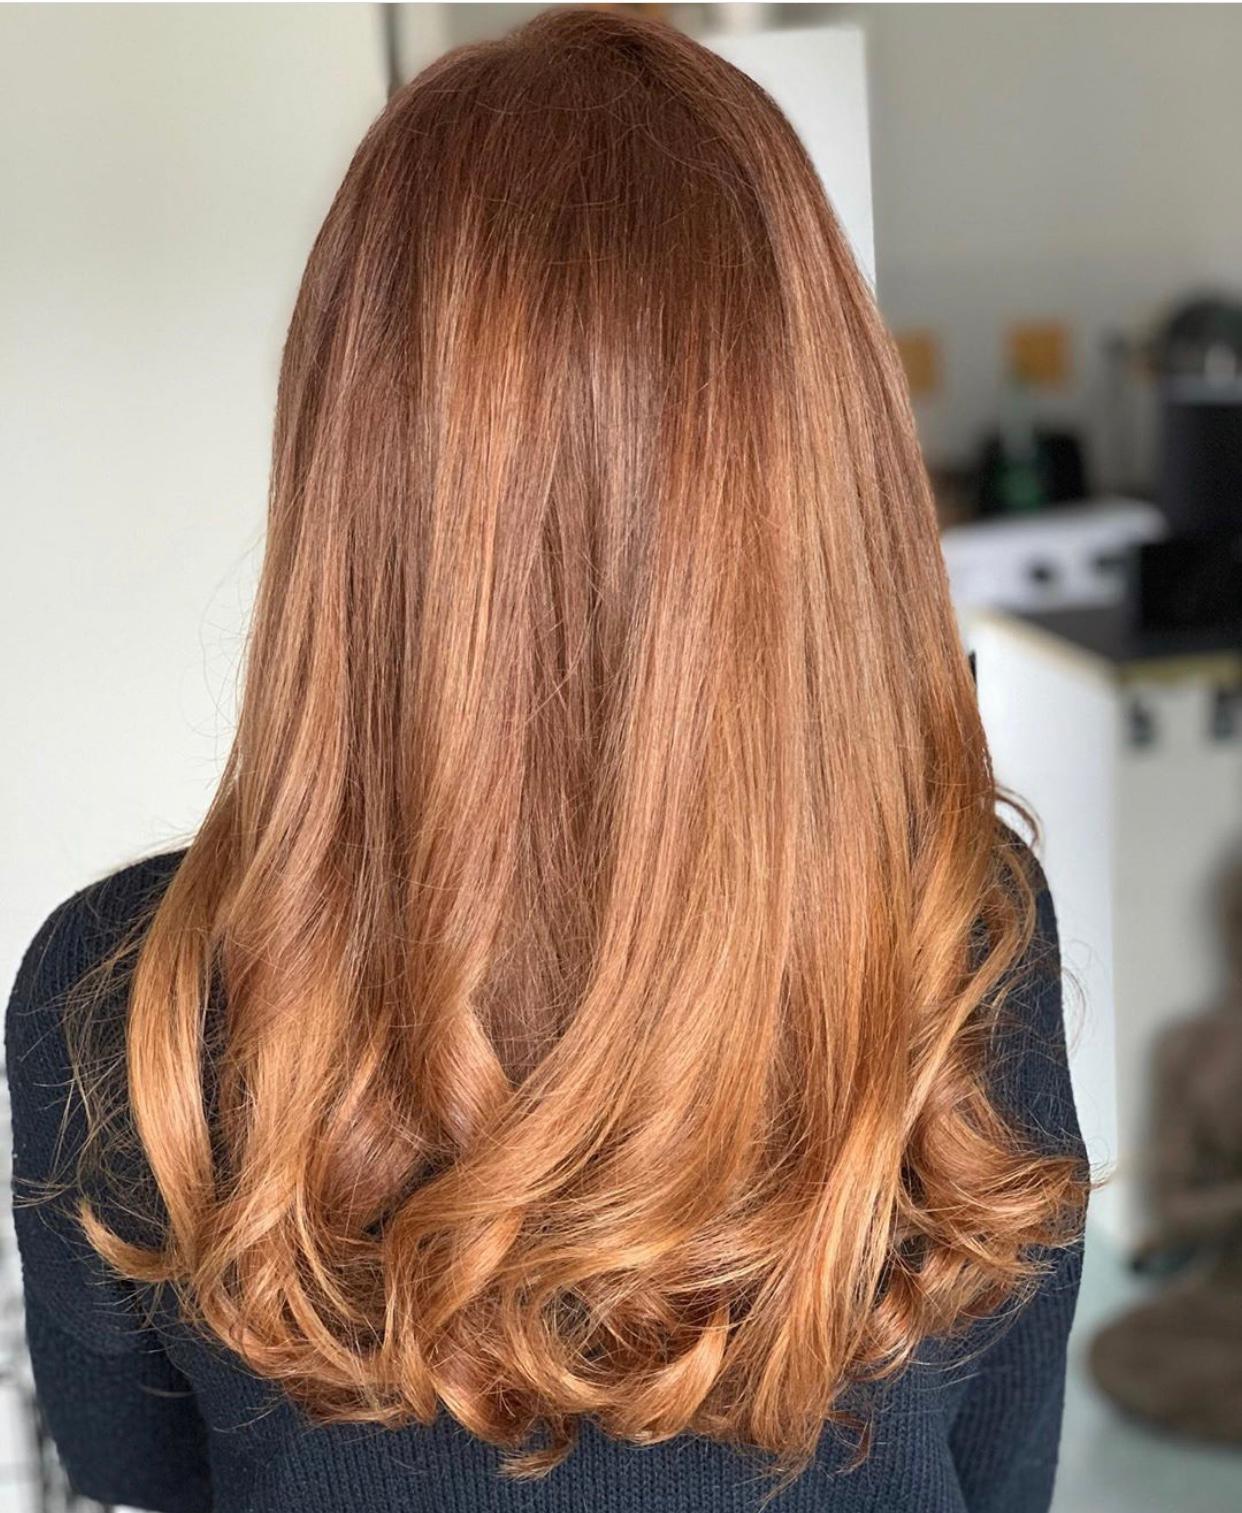 aml-nantes-emmanuelle-coiffure-lissage-04-29